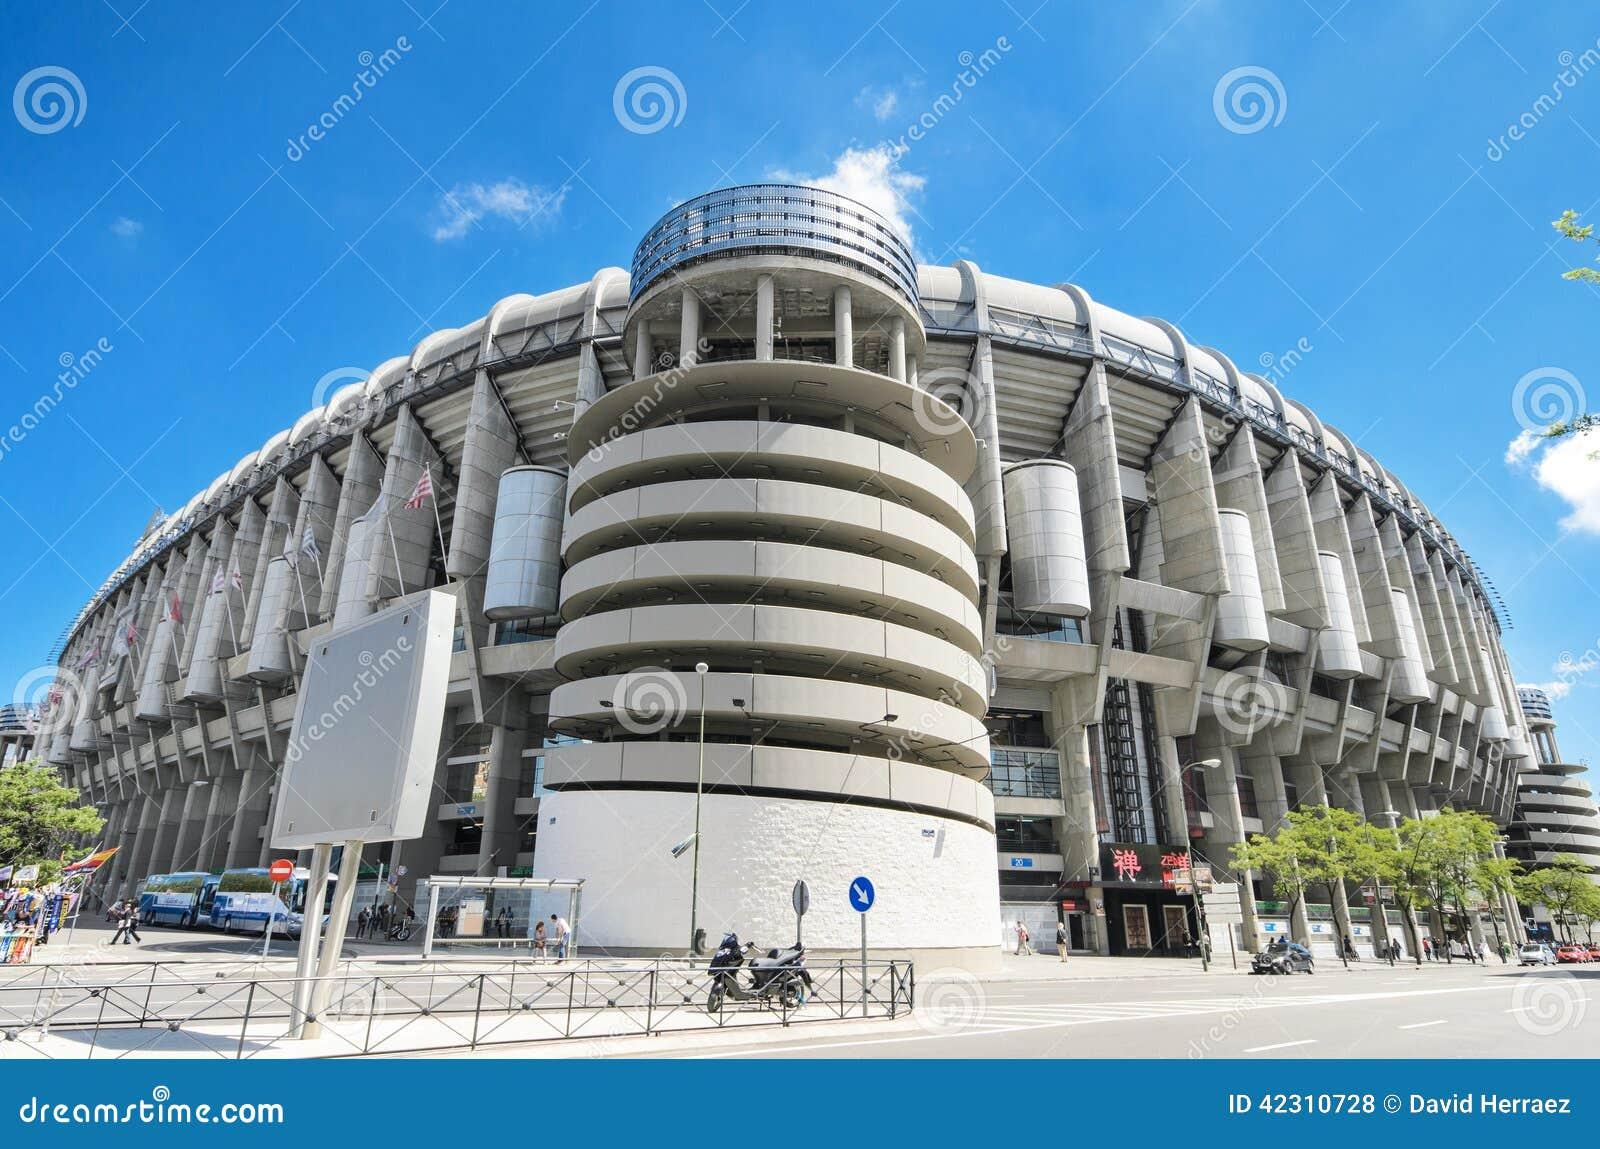 Real Madrid football club Santiago Bernabeu stadium.